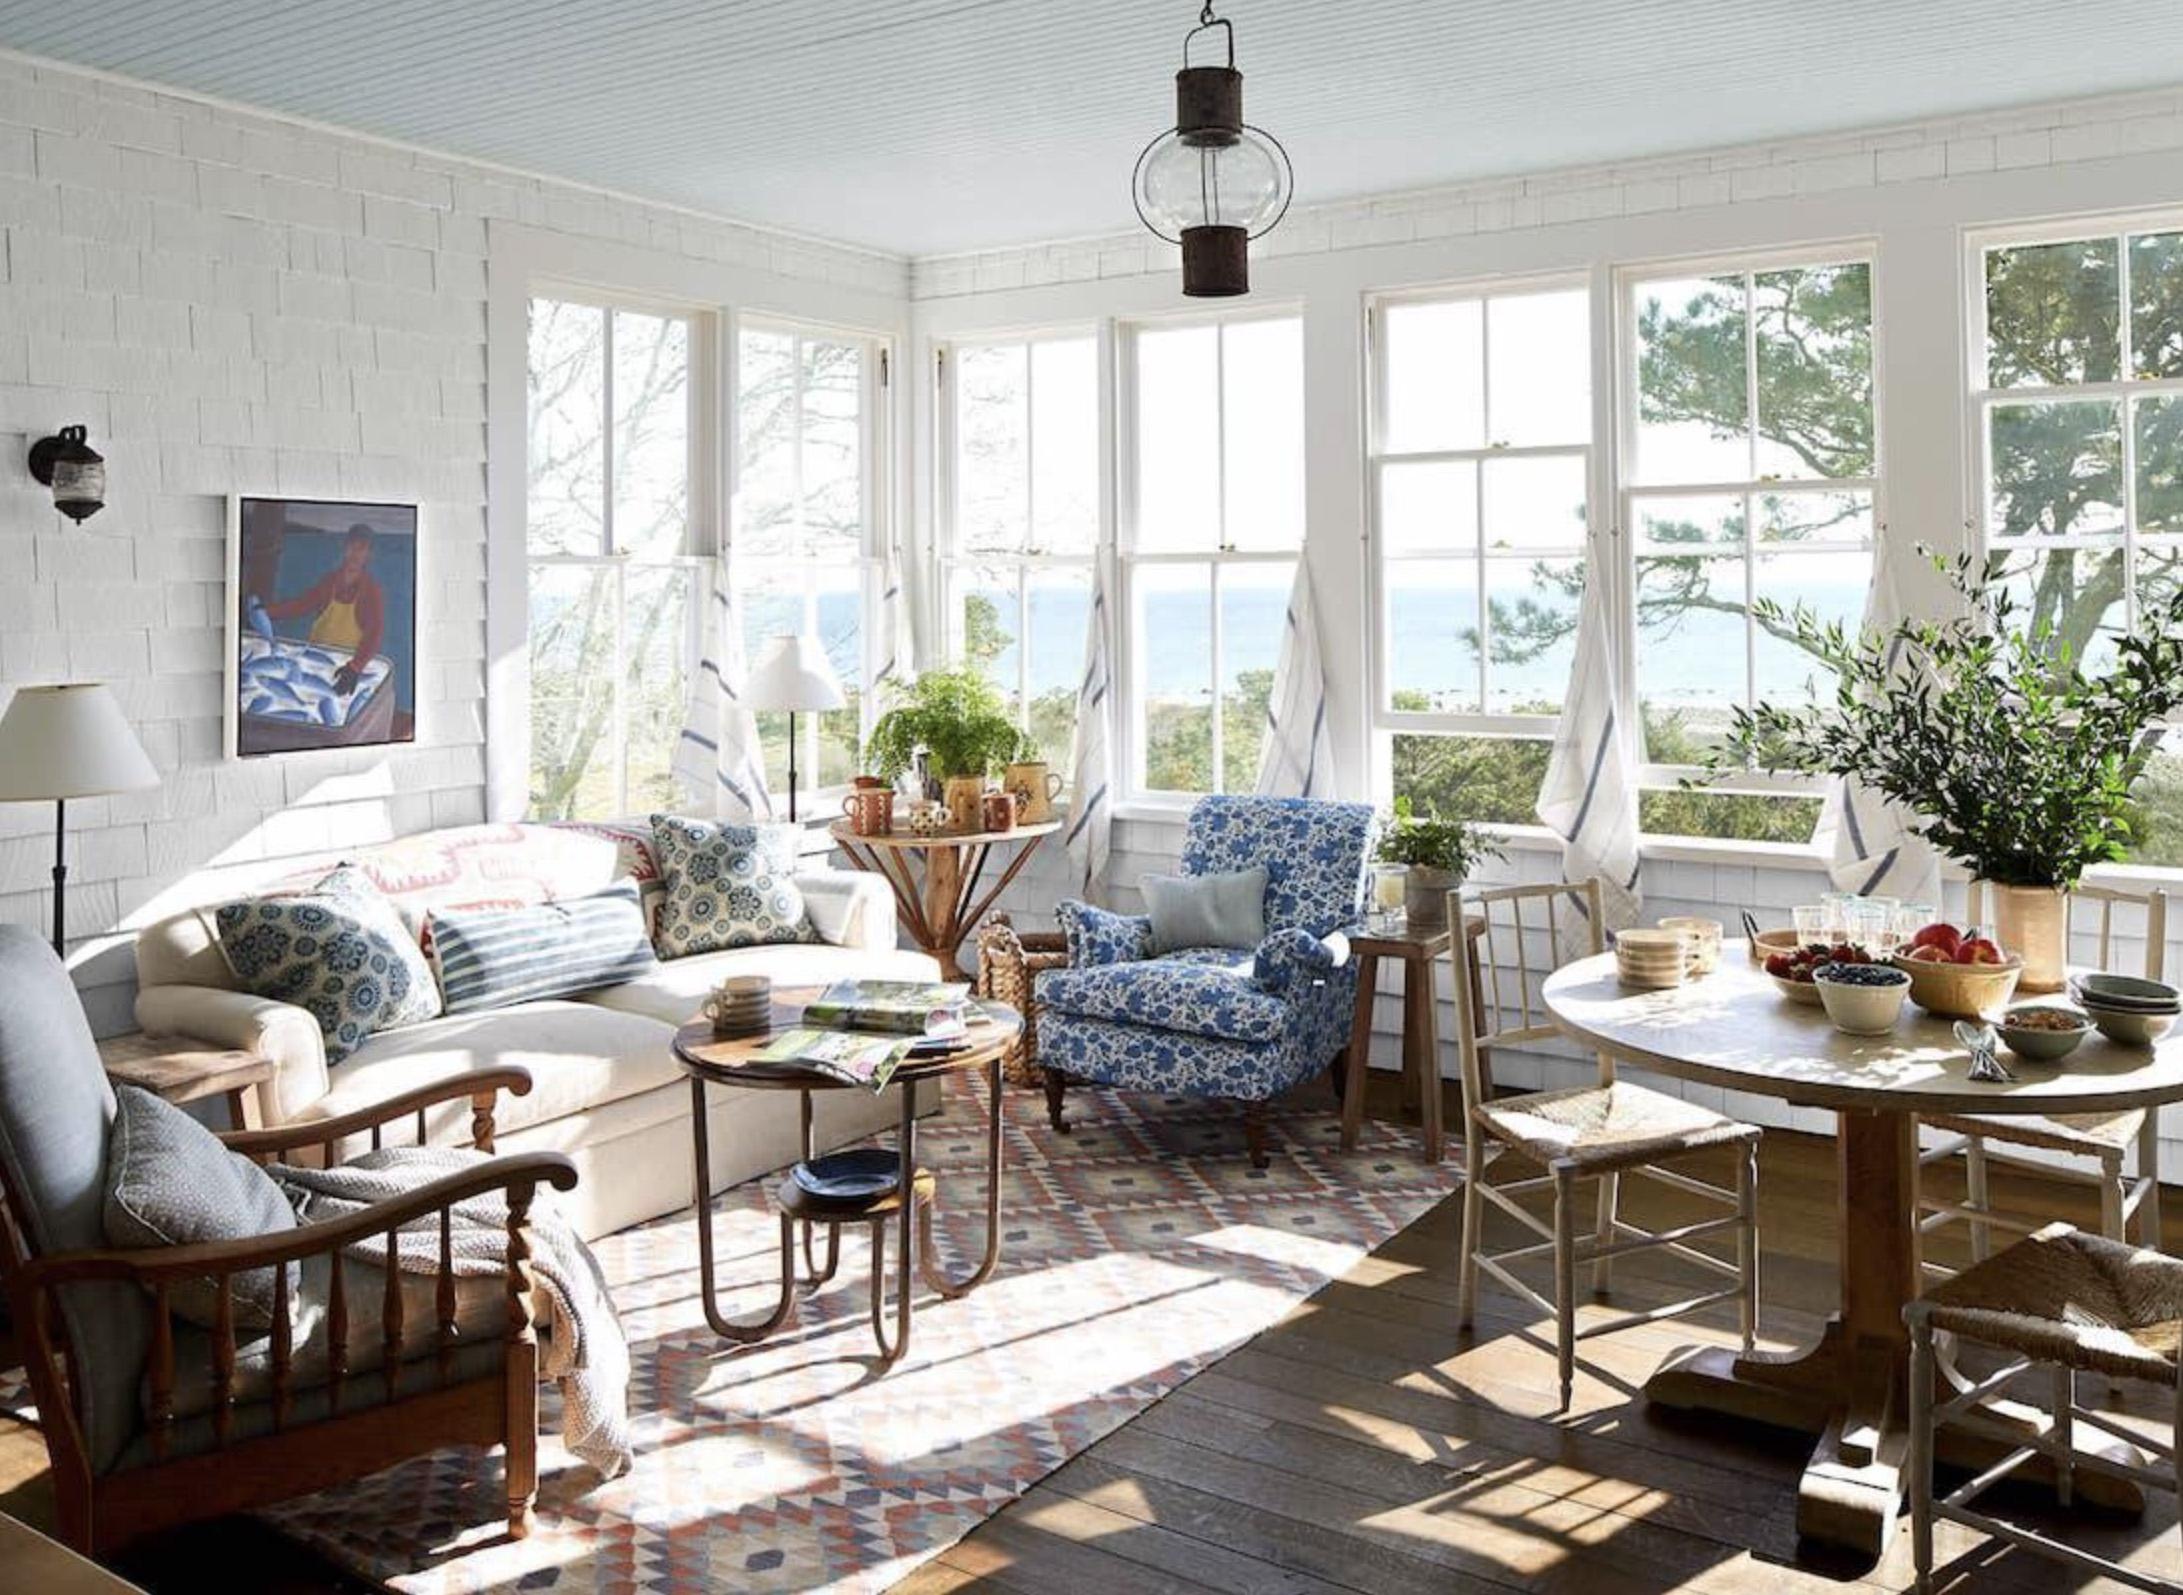 House Beautiful Liliane Hart 2018 Hook and Grommet Window